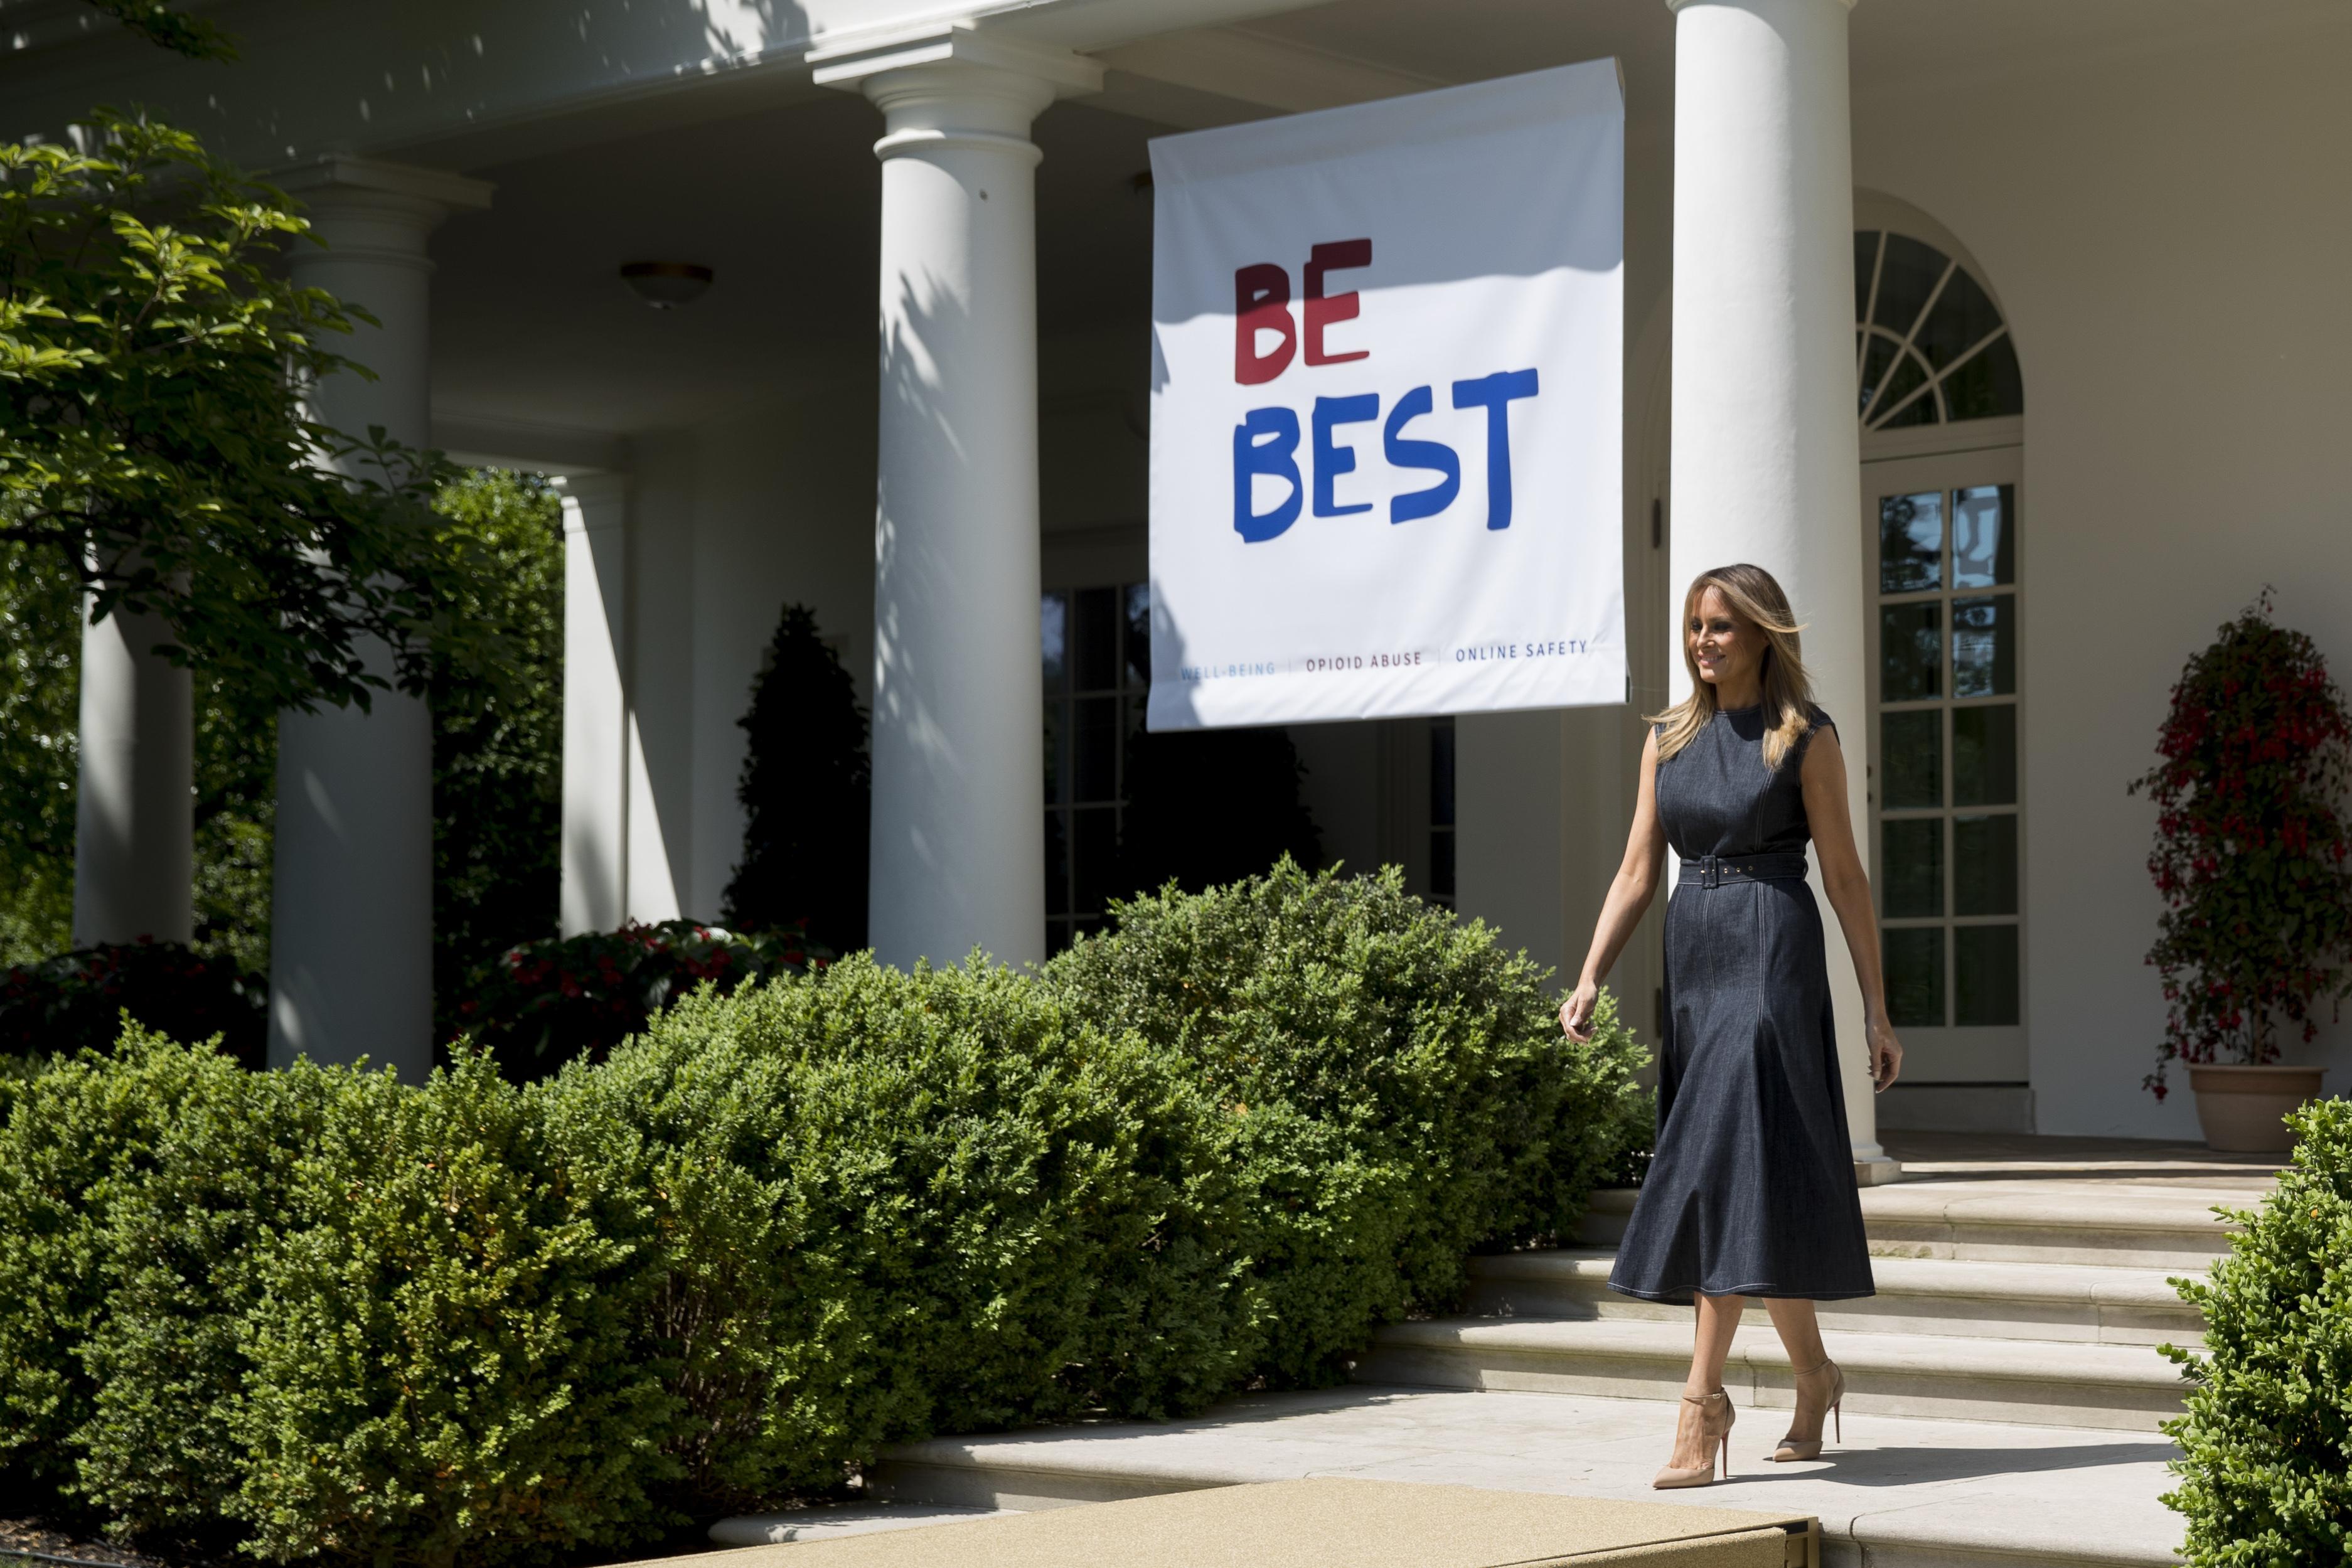 Melania Trump S Rose Garden Redo Draws Criticism But It S Long Overdue The Washington Post